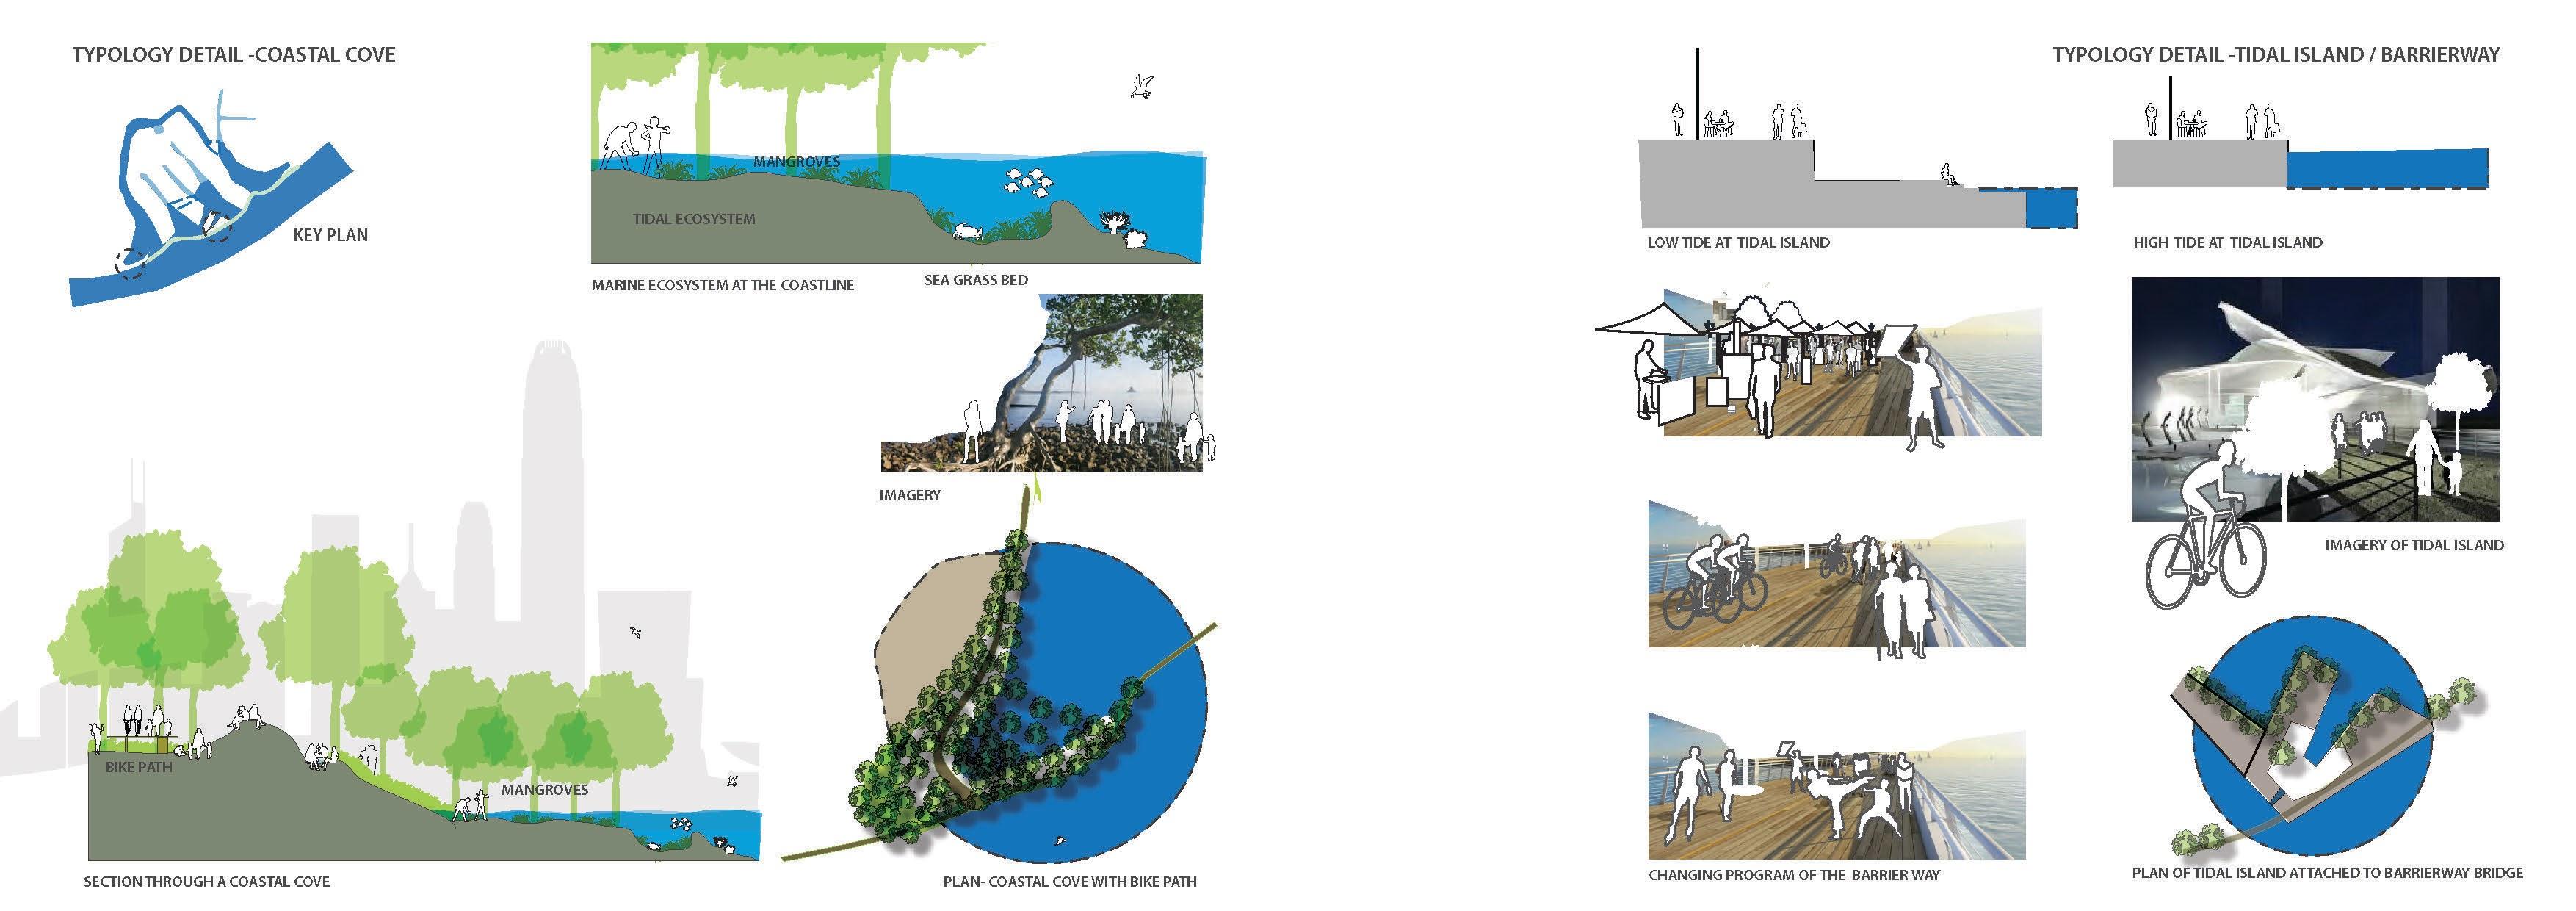 global metro urbanism- coastal defibrillation_Page_14